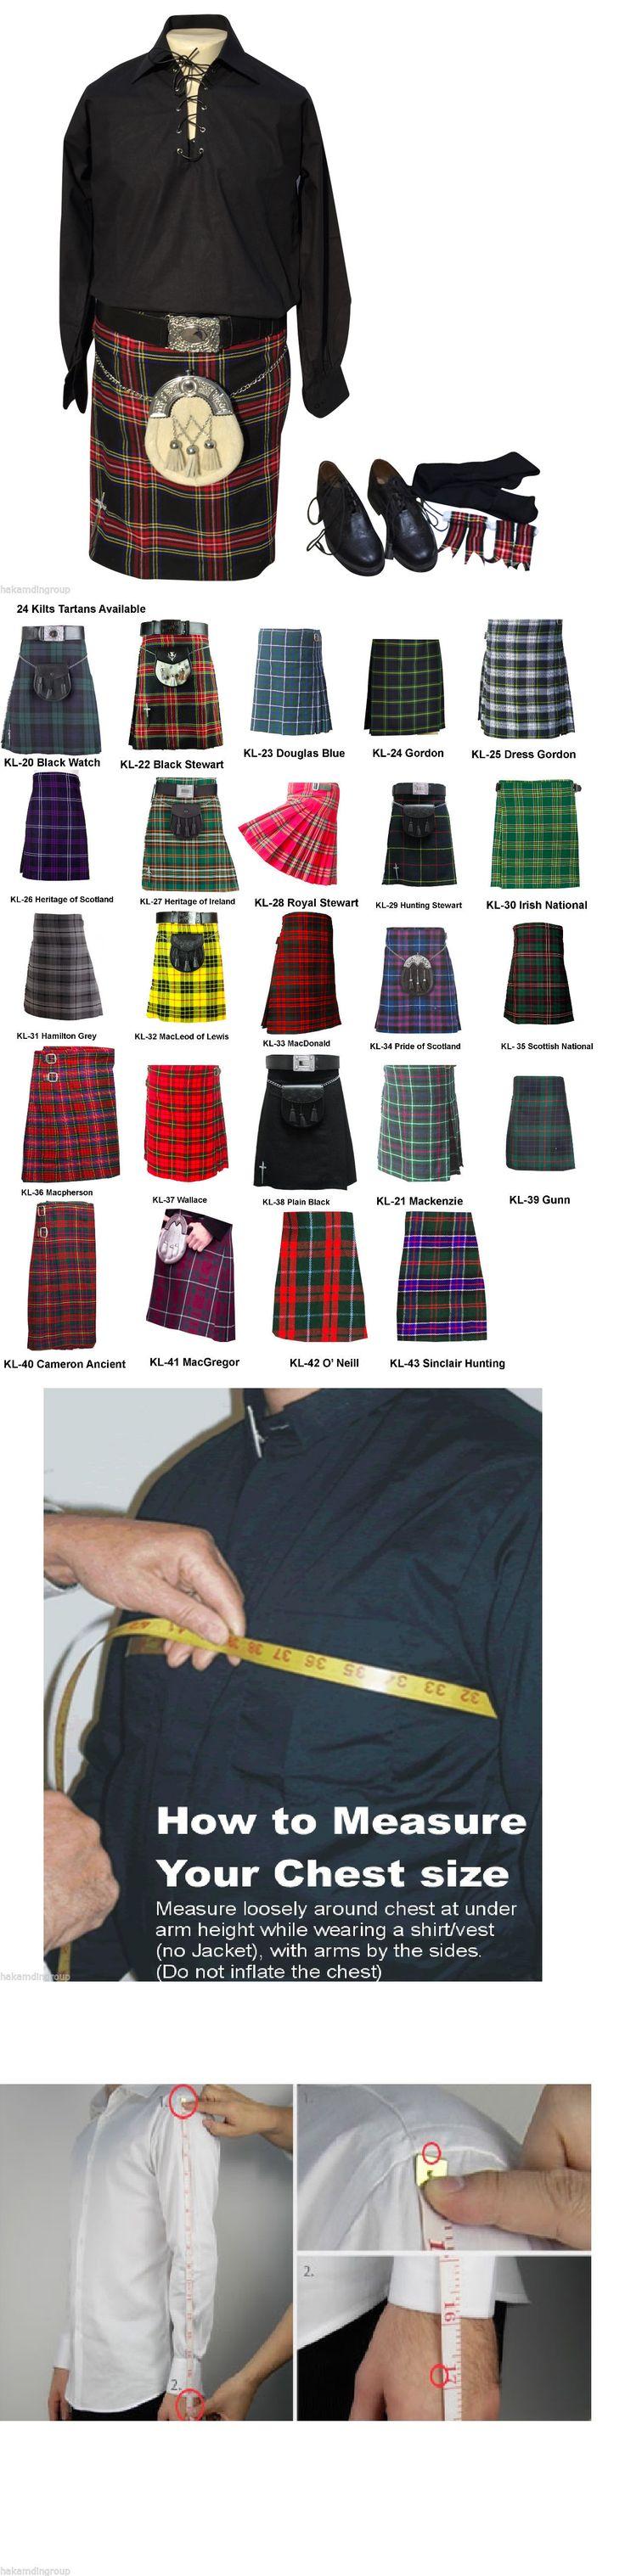 Kilts and Sporrans 112424: 10 Pcs Kilt Outfit, Jacobite Shirt, Kilts, Kilt Belt, Kilt Pin, Sporran, Ghillie -> BUY IT NOW ONLY: $165 on eBay!